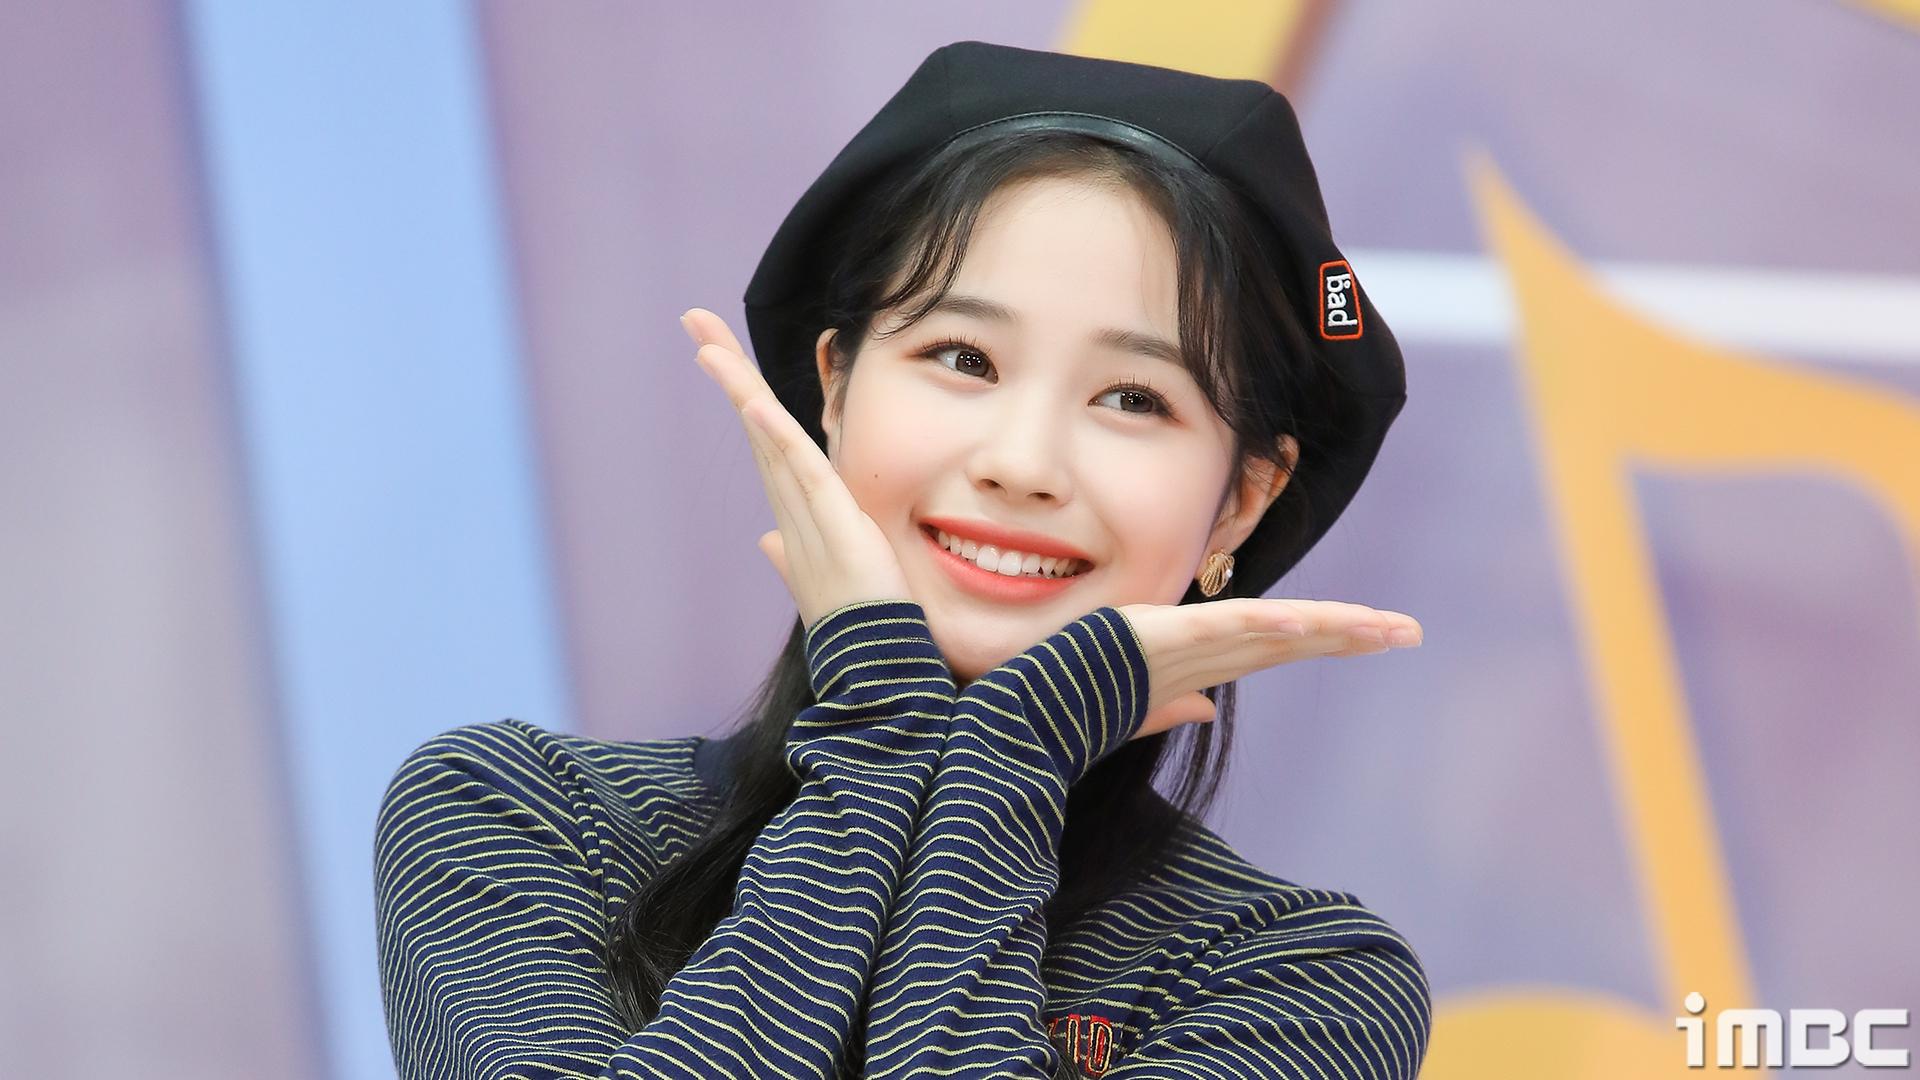 [M픽] 위클리 지한, 남심 녹이는 귀여운 미소